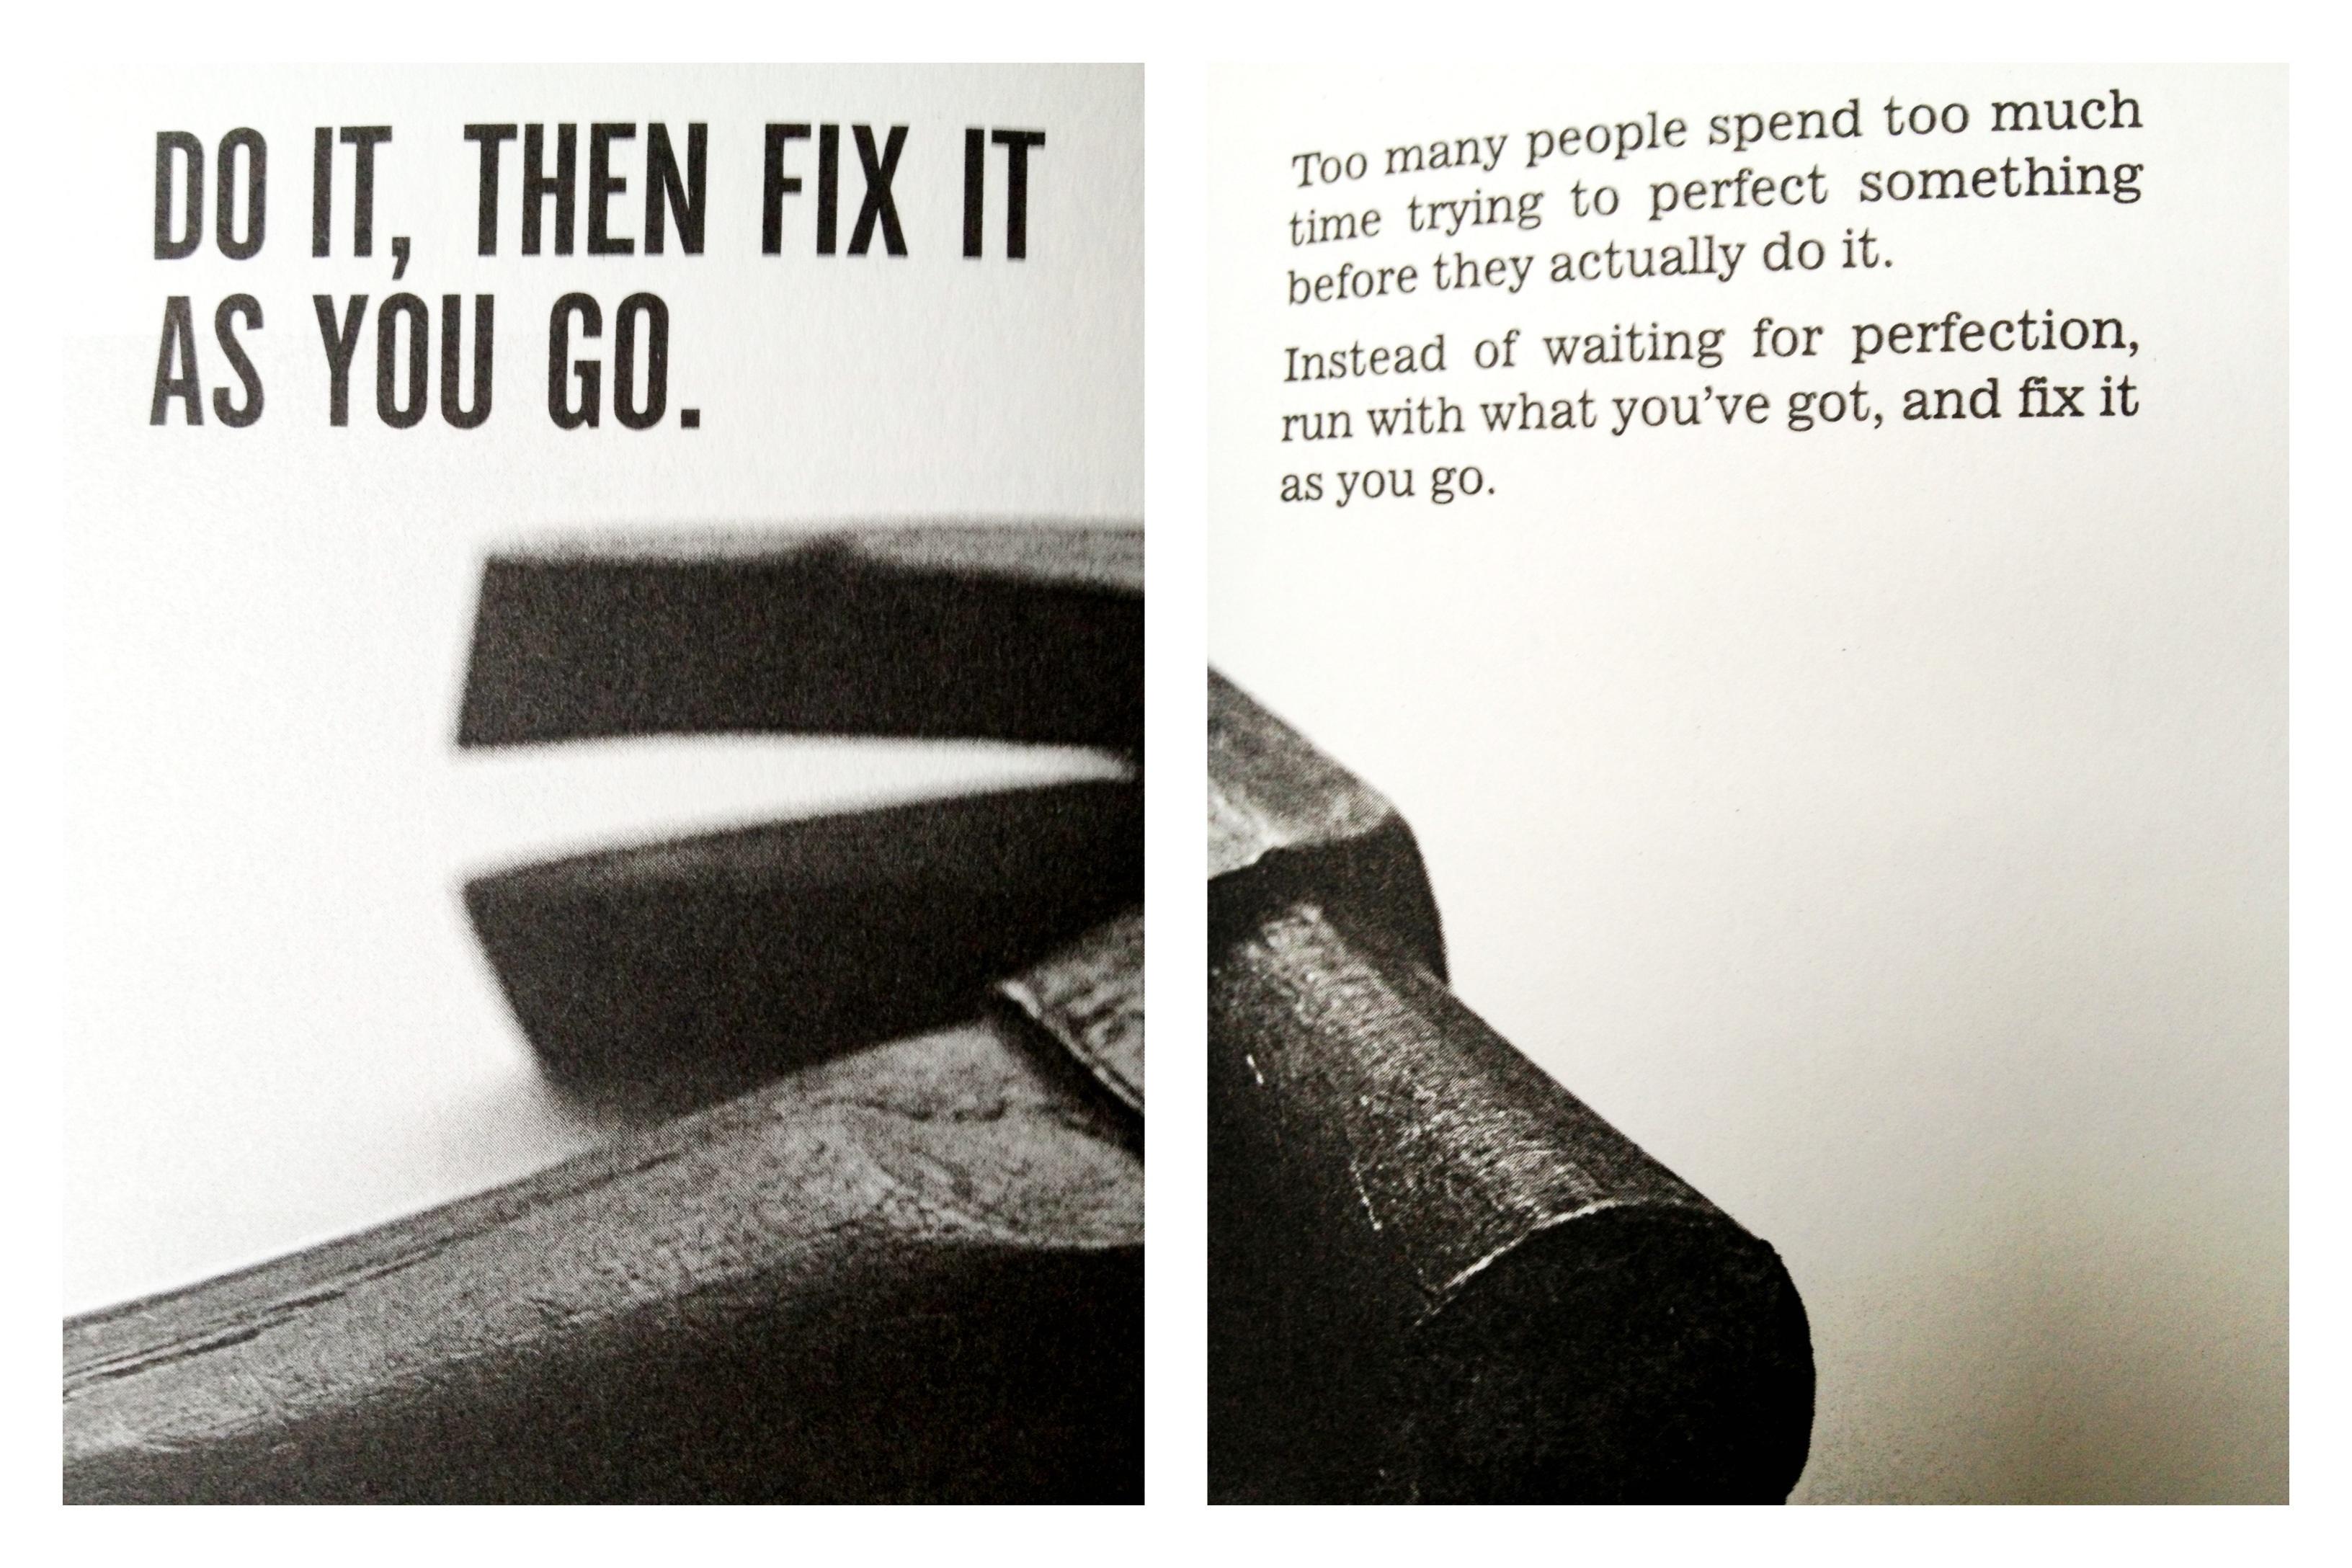 Paul Arden's quote #1